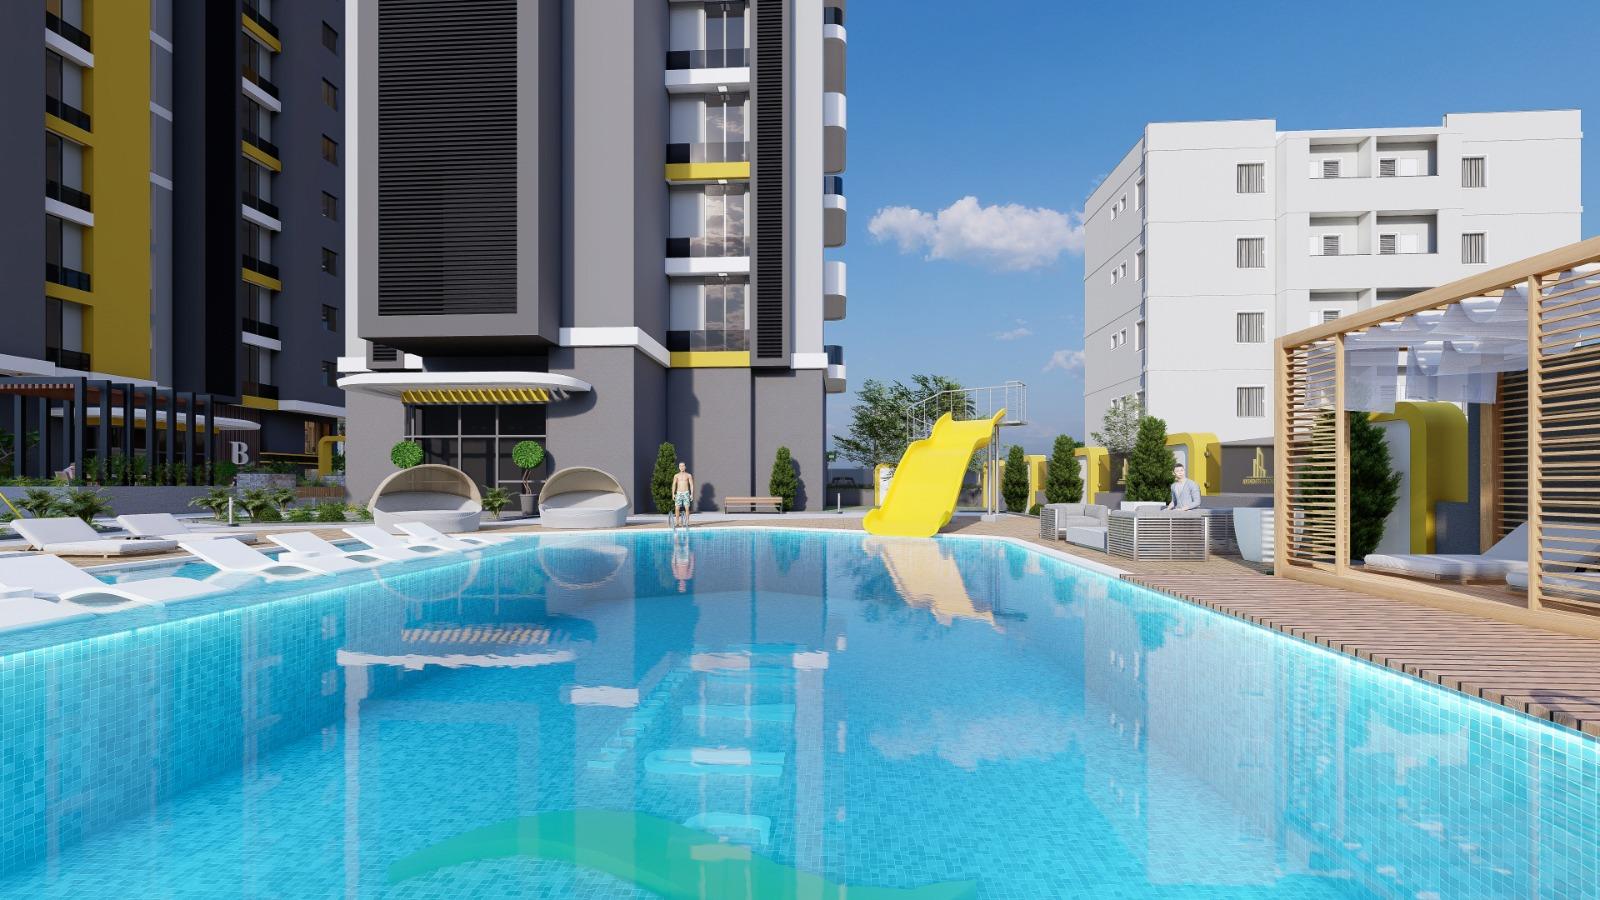 Квартиры в инвестиционном проекте по ценам застройщика - Фото 3